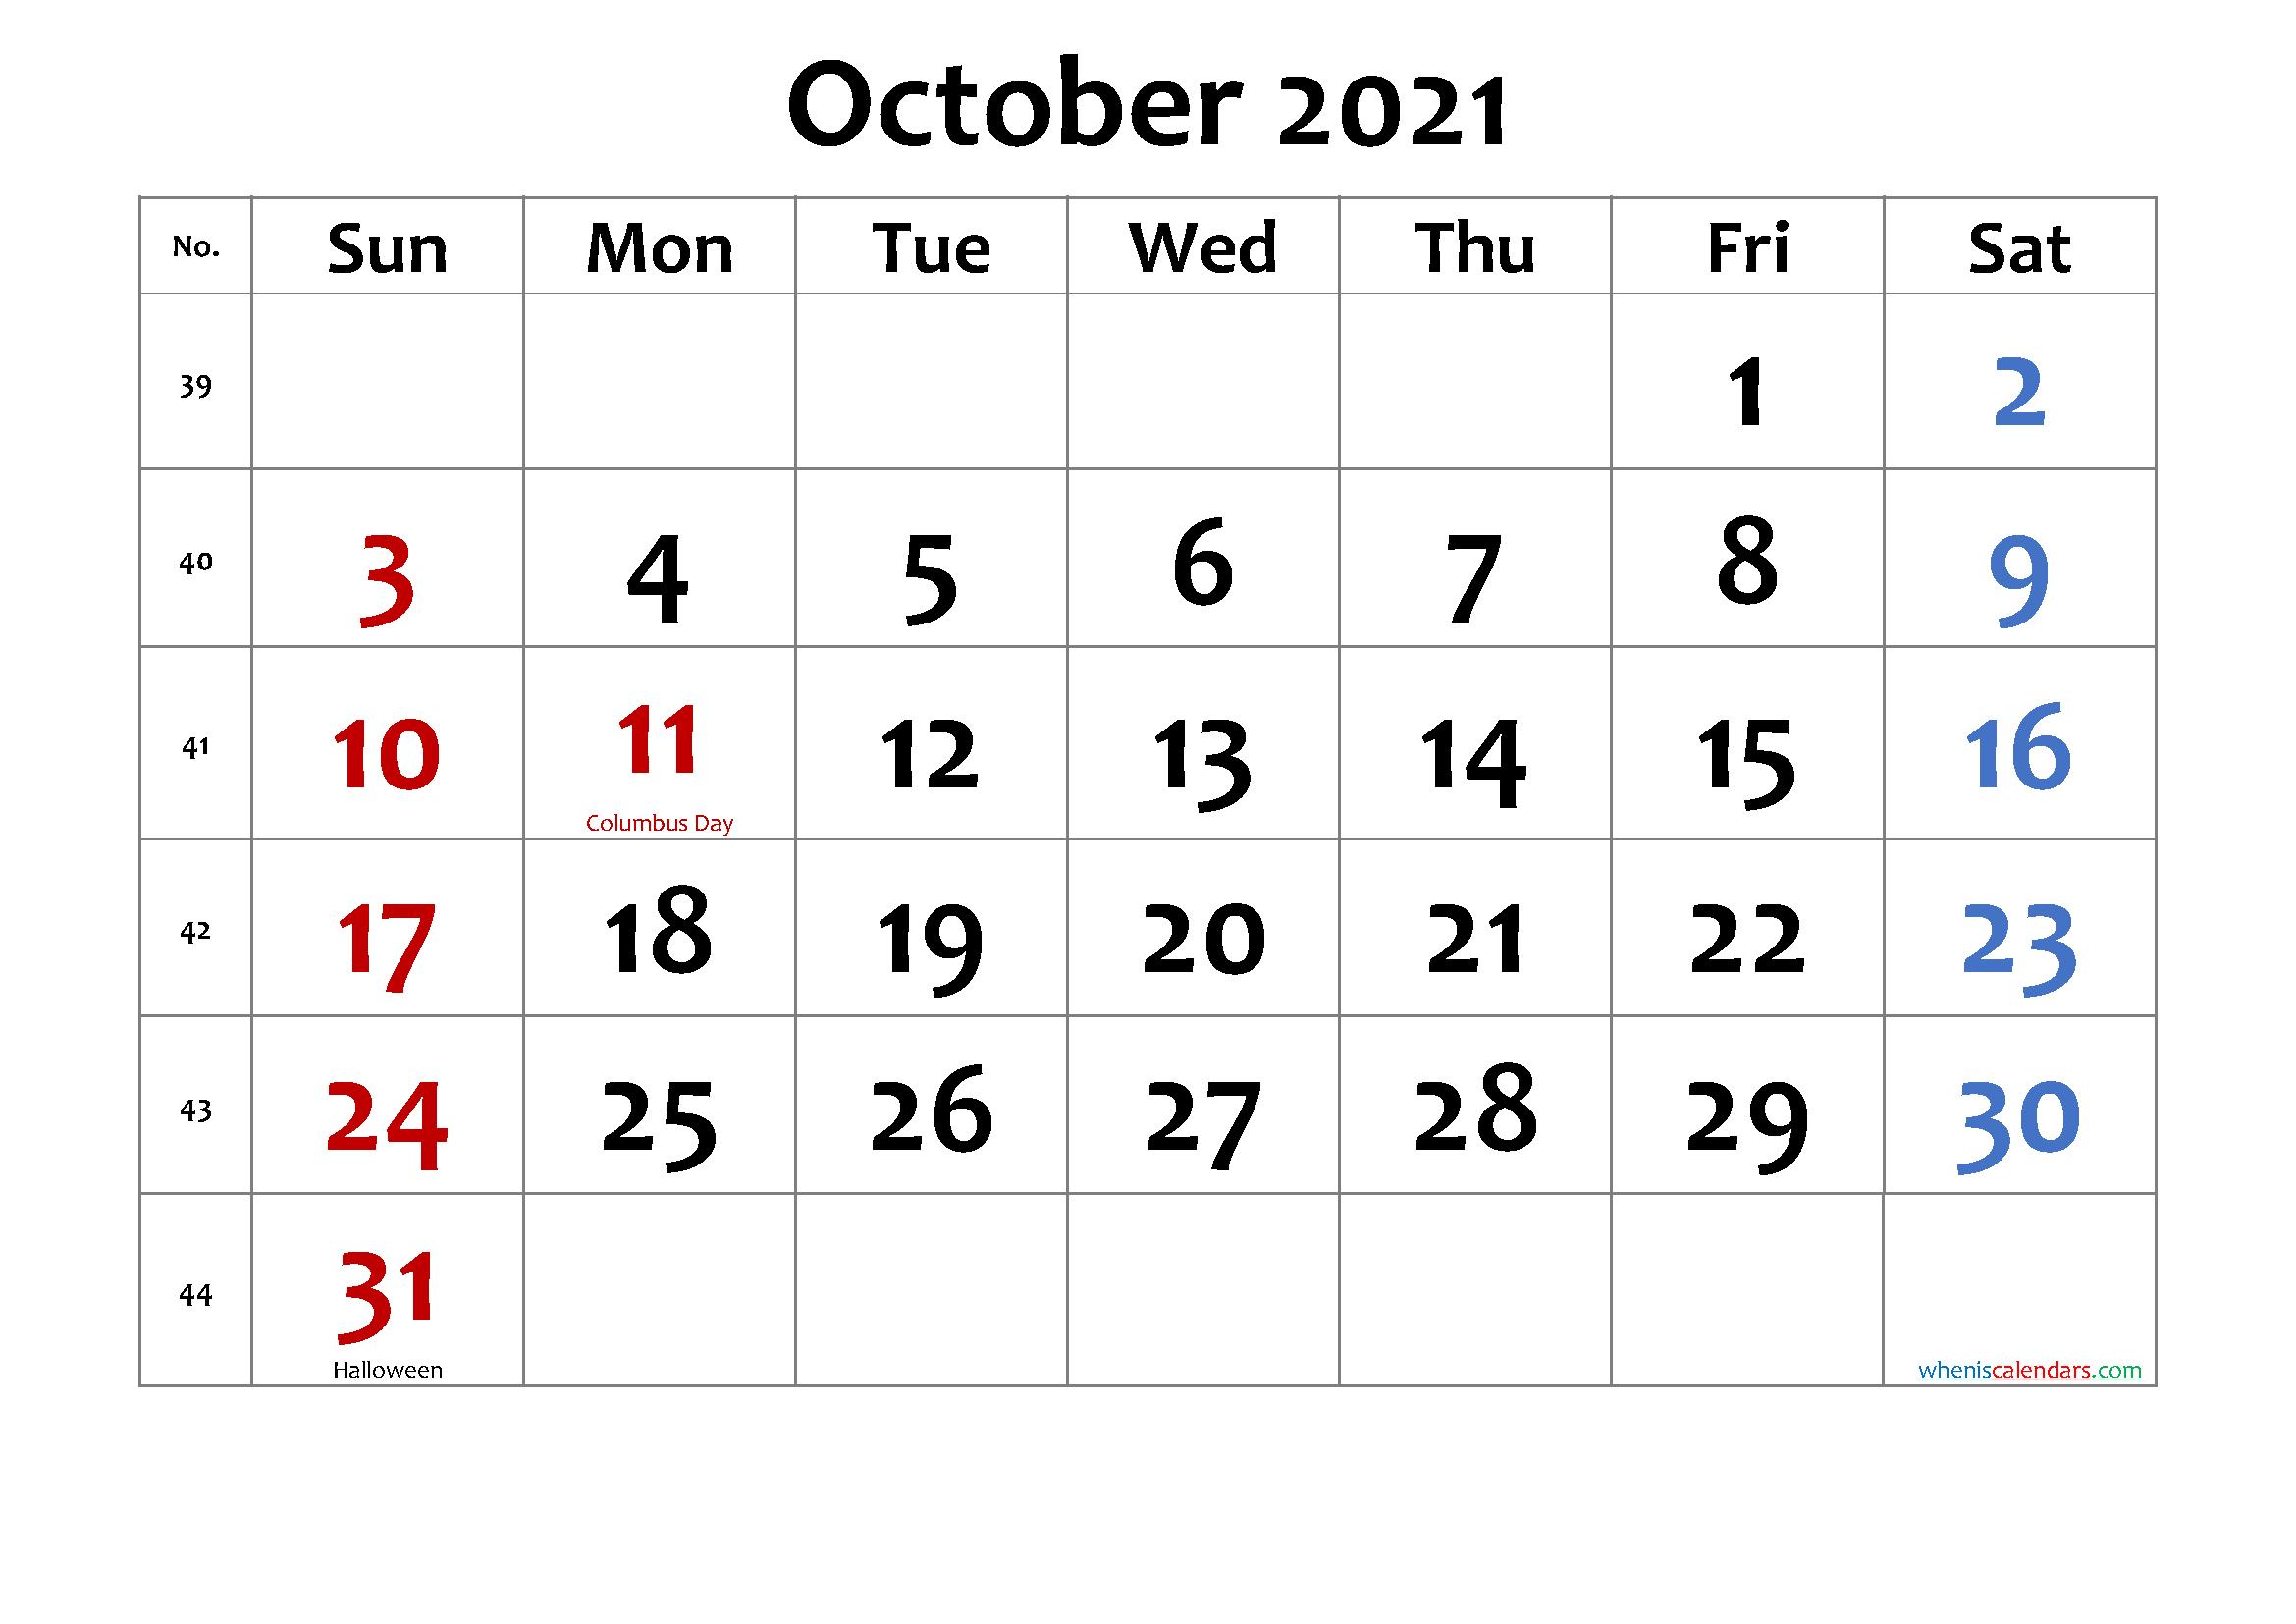 October 2021 Printable Calendar with Holidays